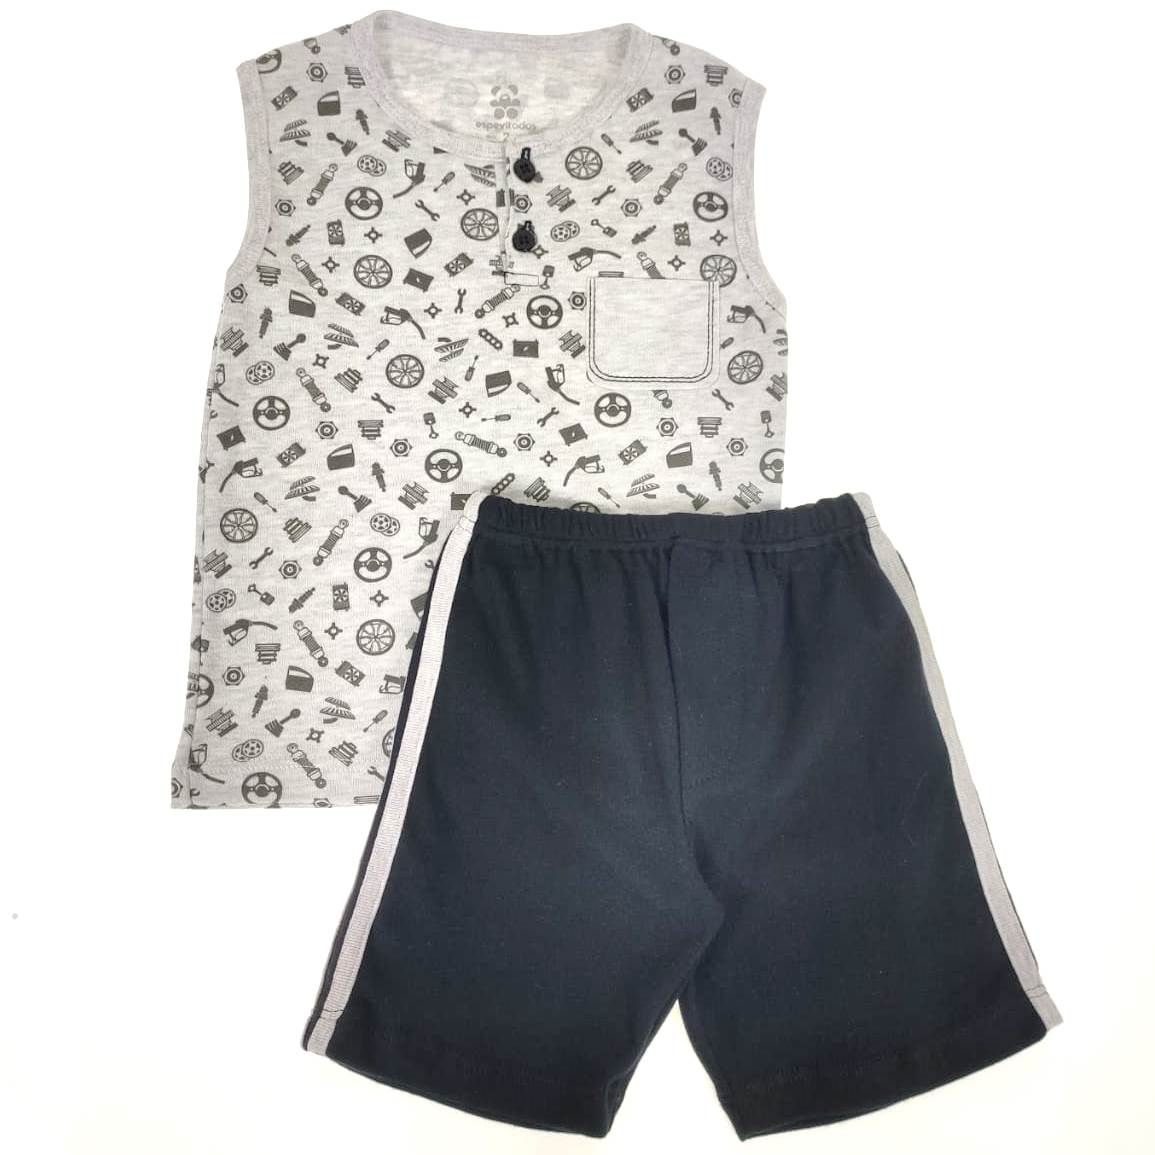 Conjunto Infantil Camiseta Regata e Shorts Estampa